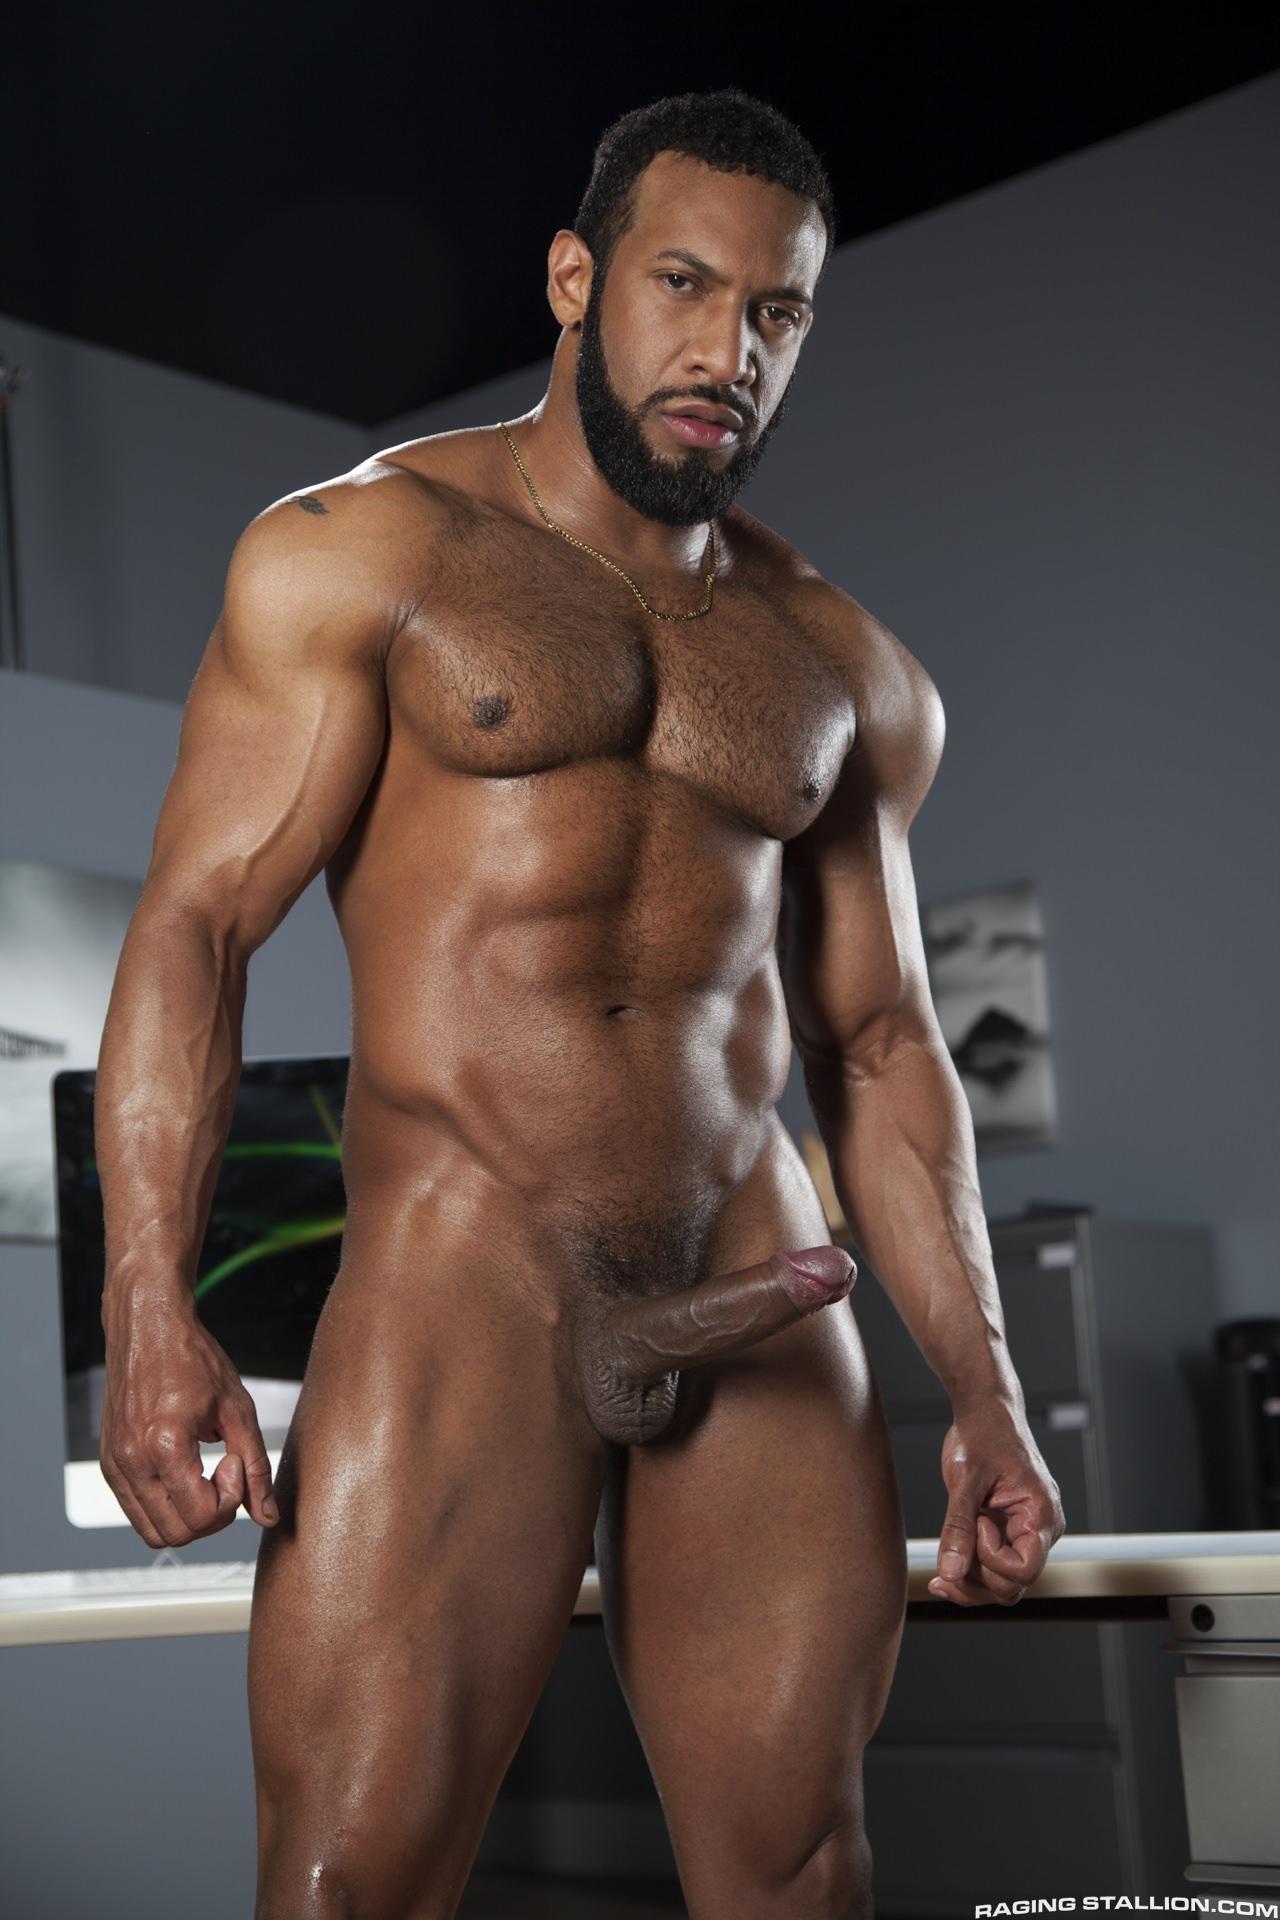 Men Seeking Men gay scenes than Pornhub